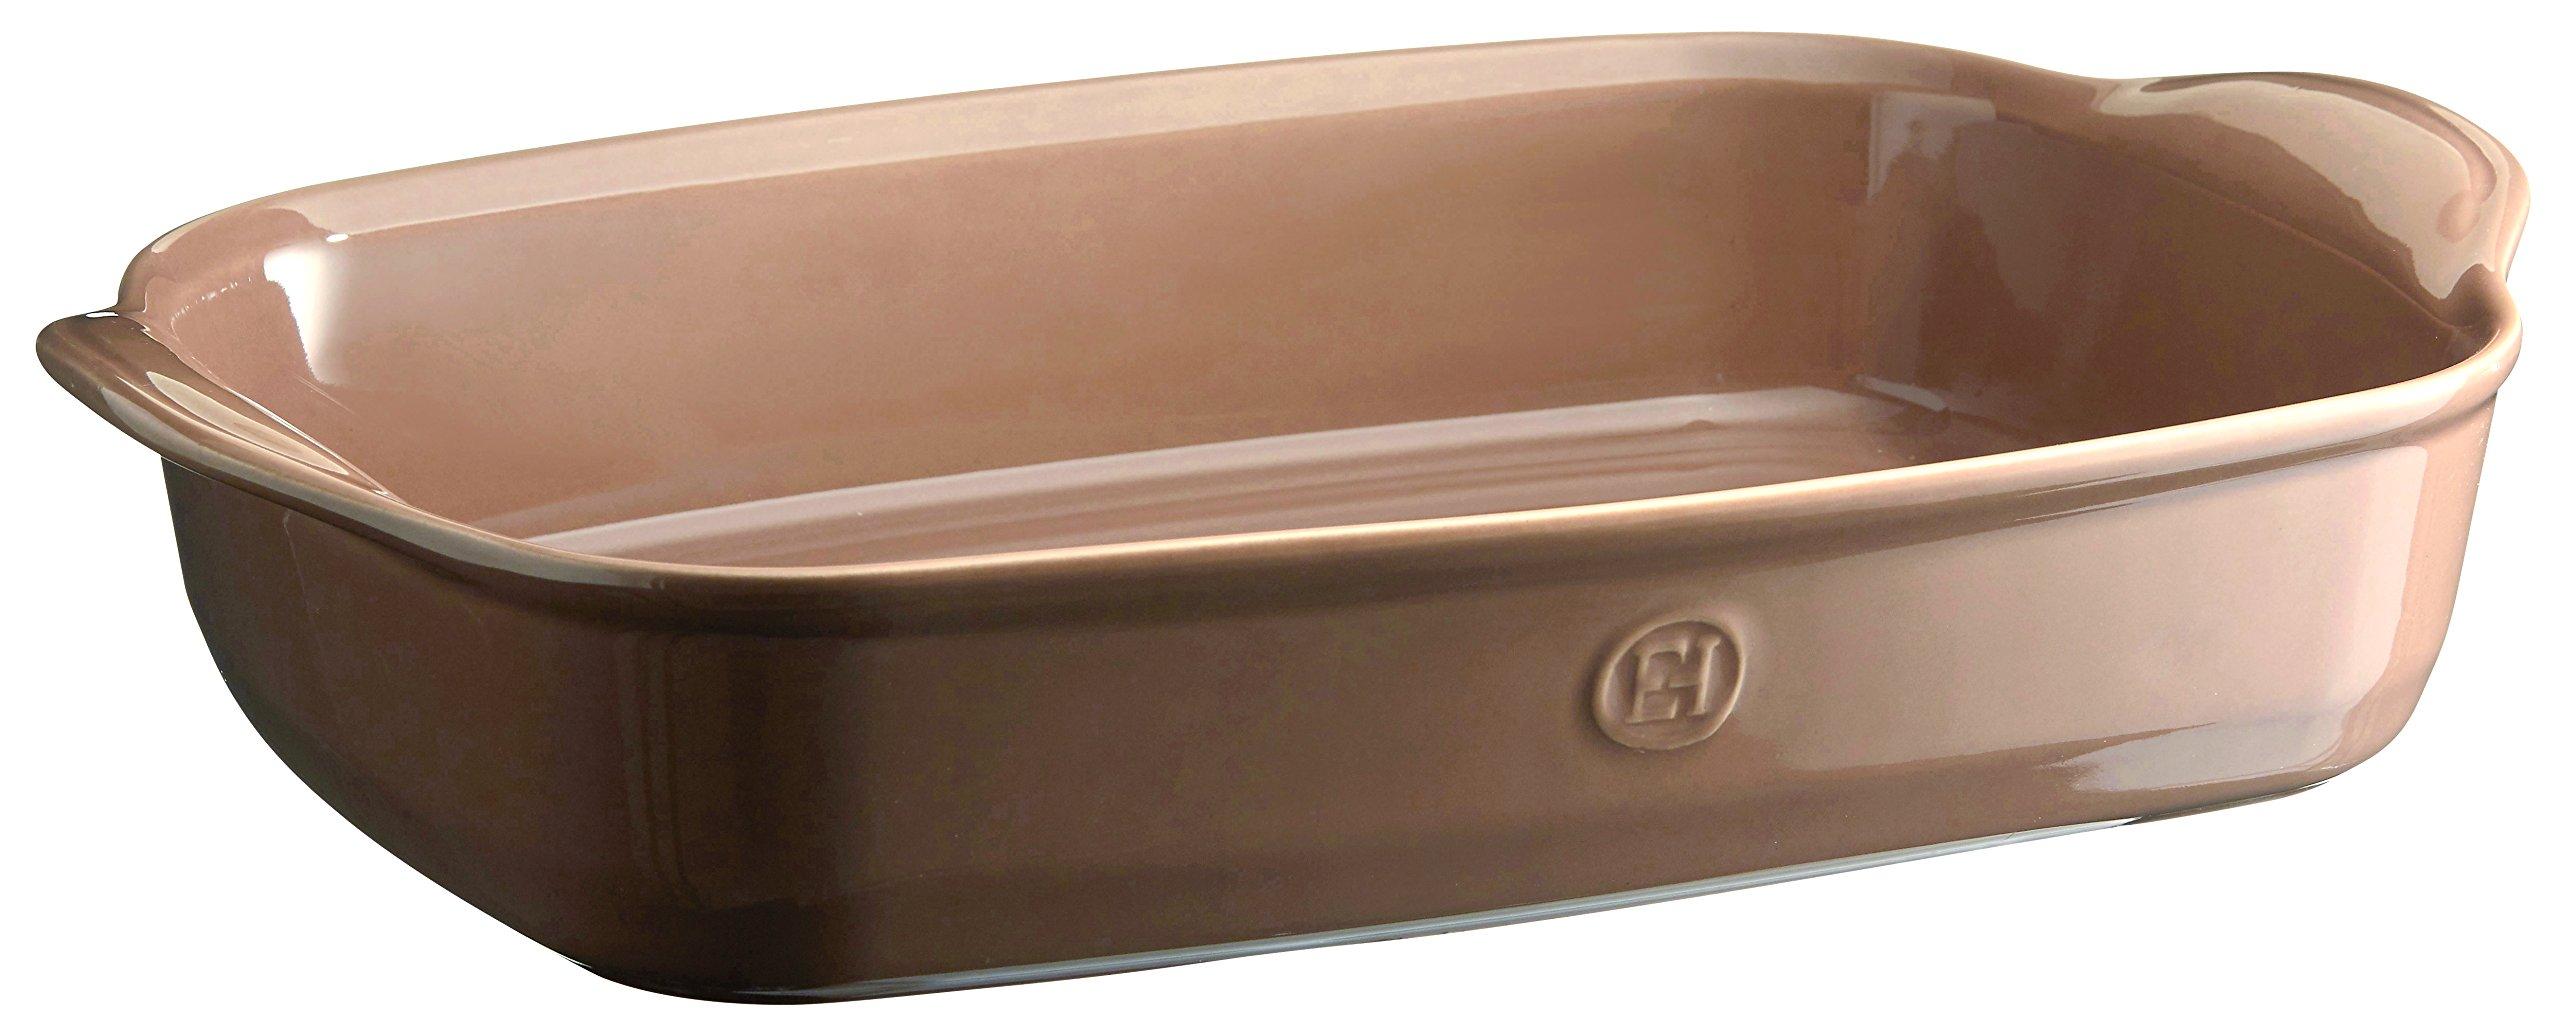 Emile Henry 969654 France Ovenware Ultime Rectangular Baking Dish, 16.5 x 10.6, Oak by Emile Henry